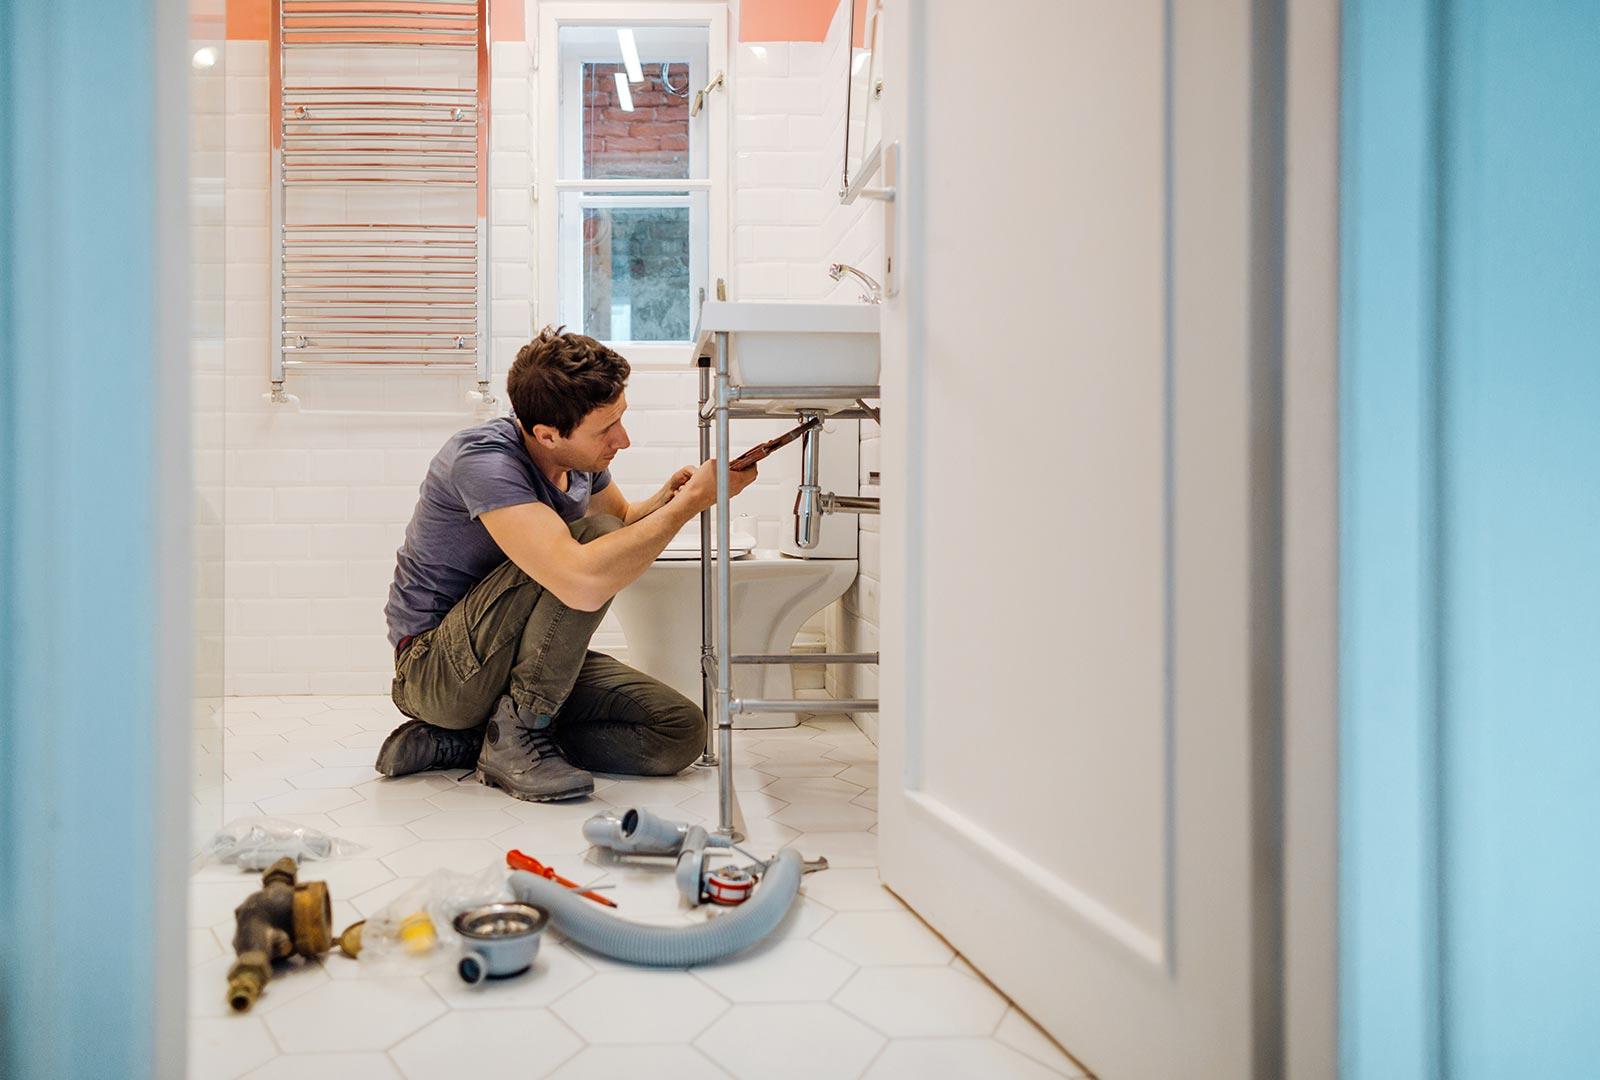 Making preventative maintenance matter